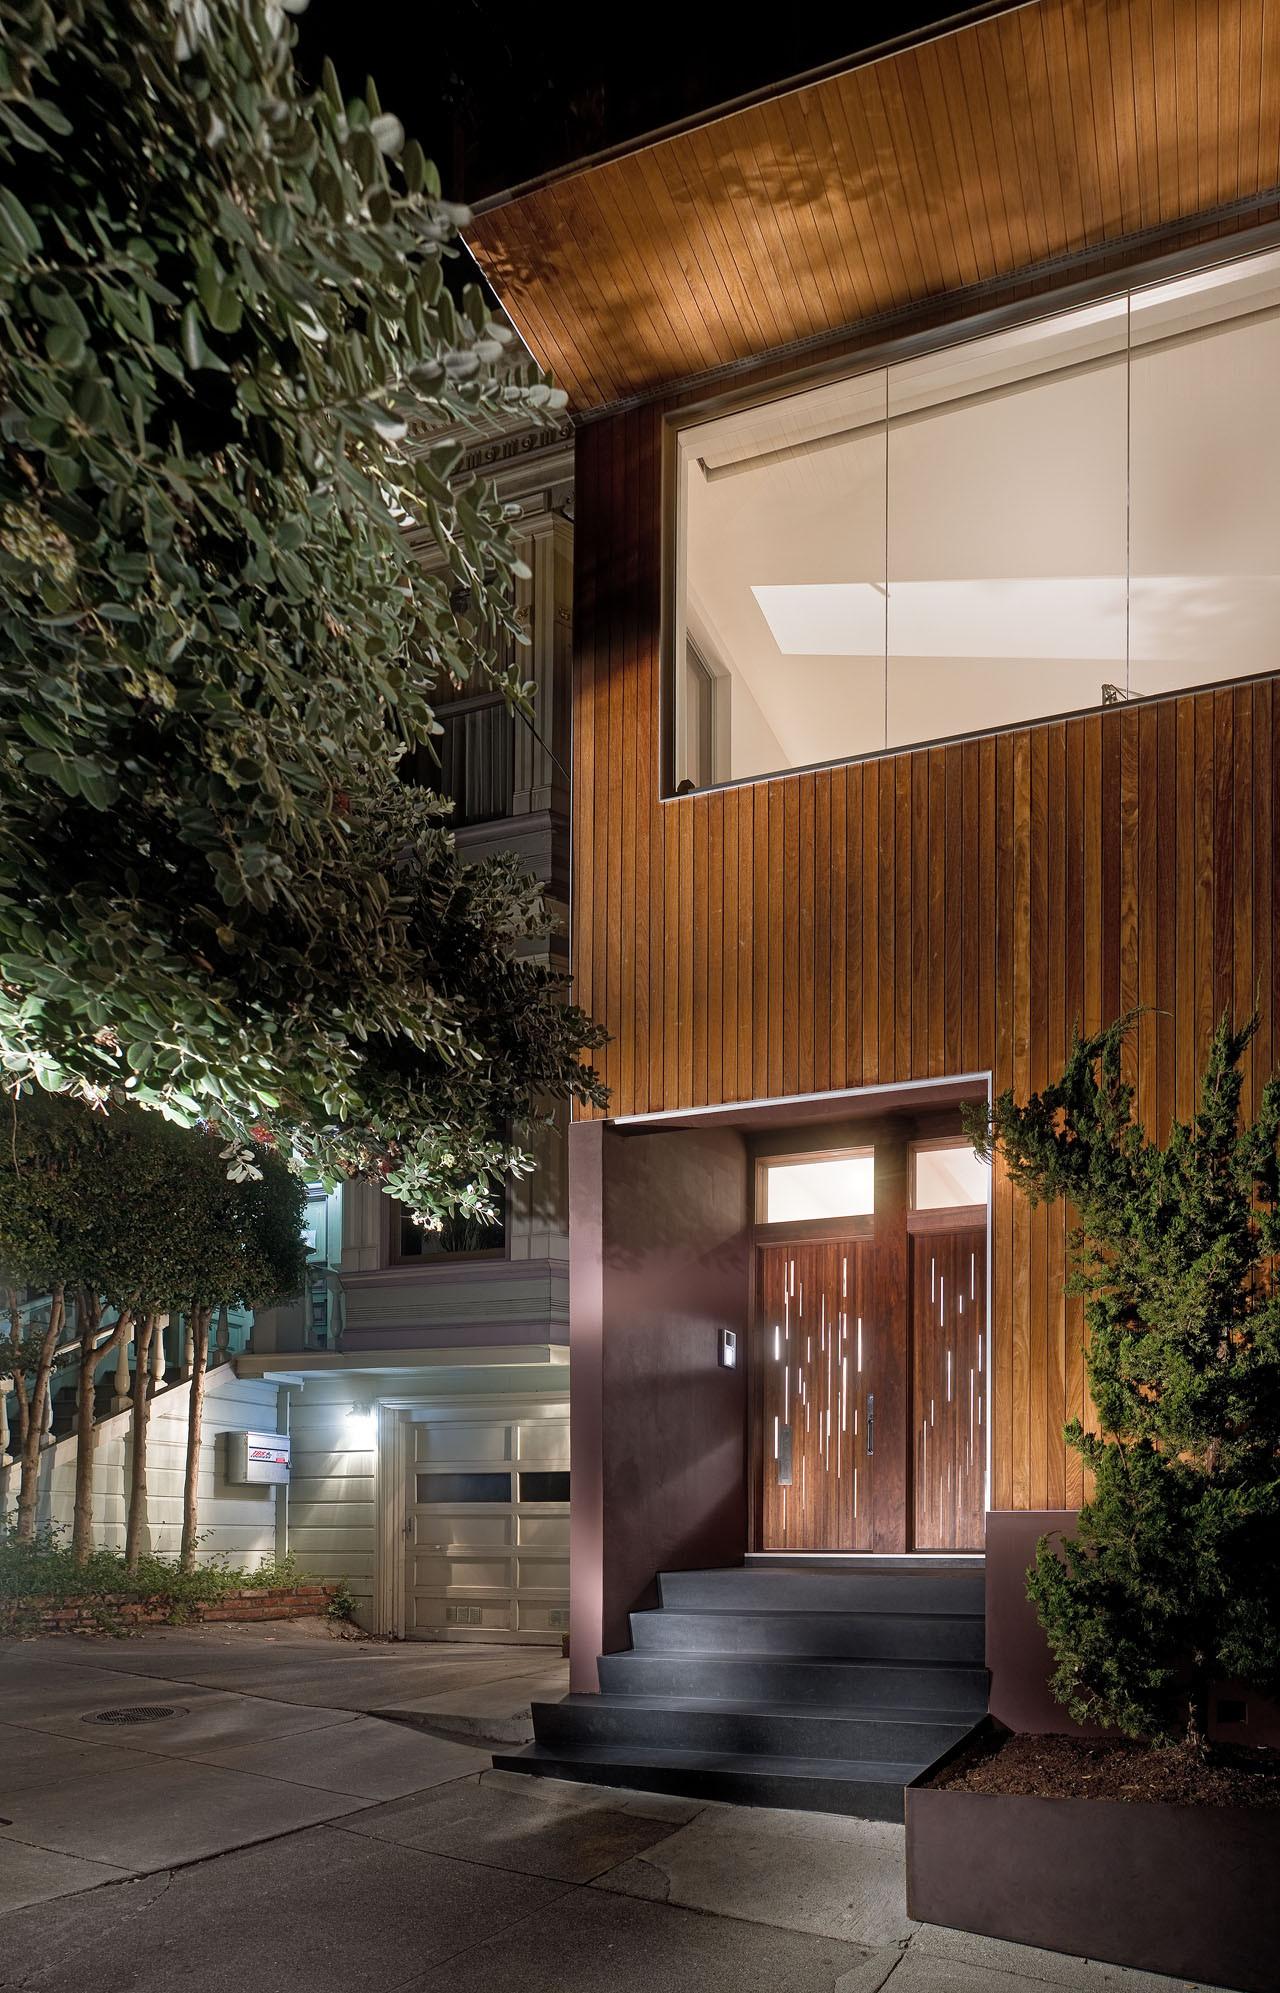 Beaver Street Reprise / Craig Steely Architecture, © Rien Van Rijthoven